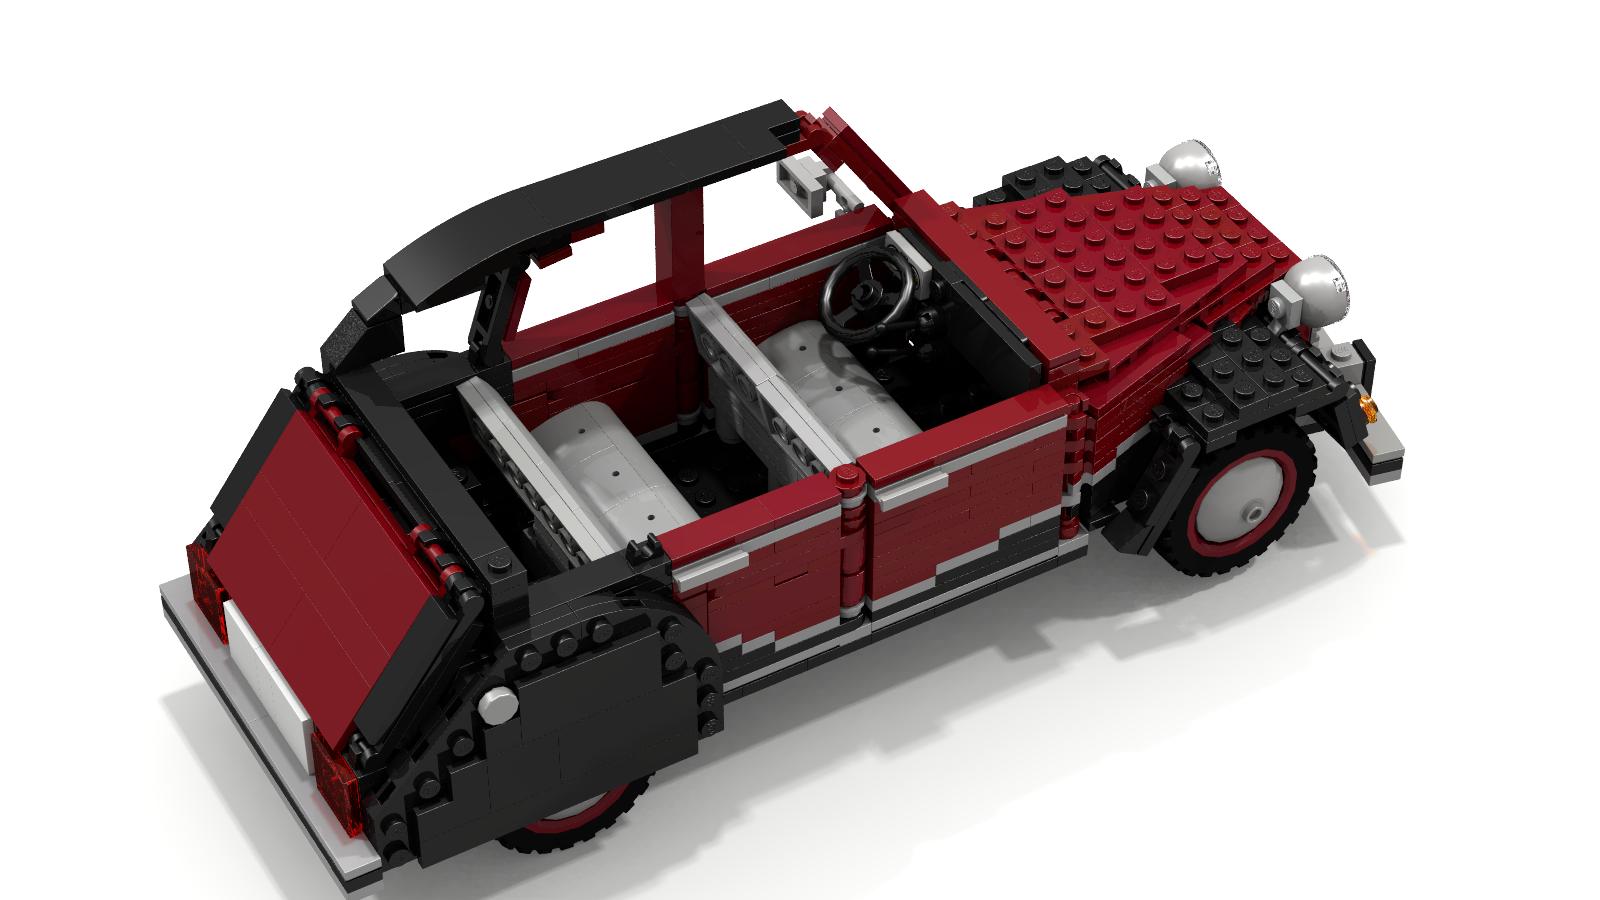 lego ideas - product ideas